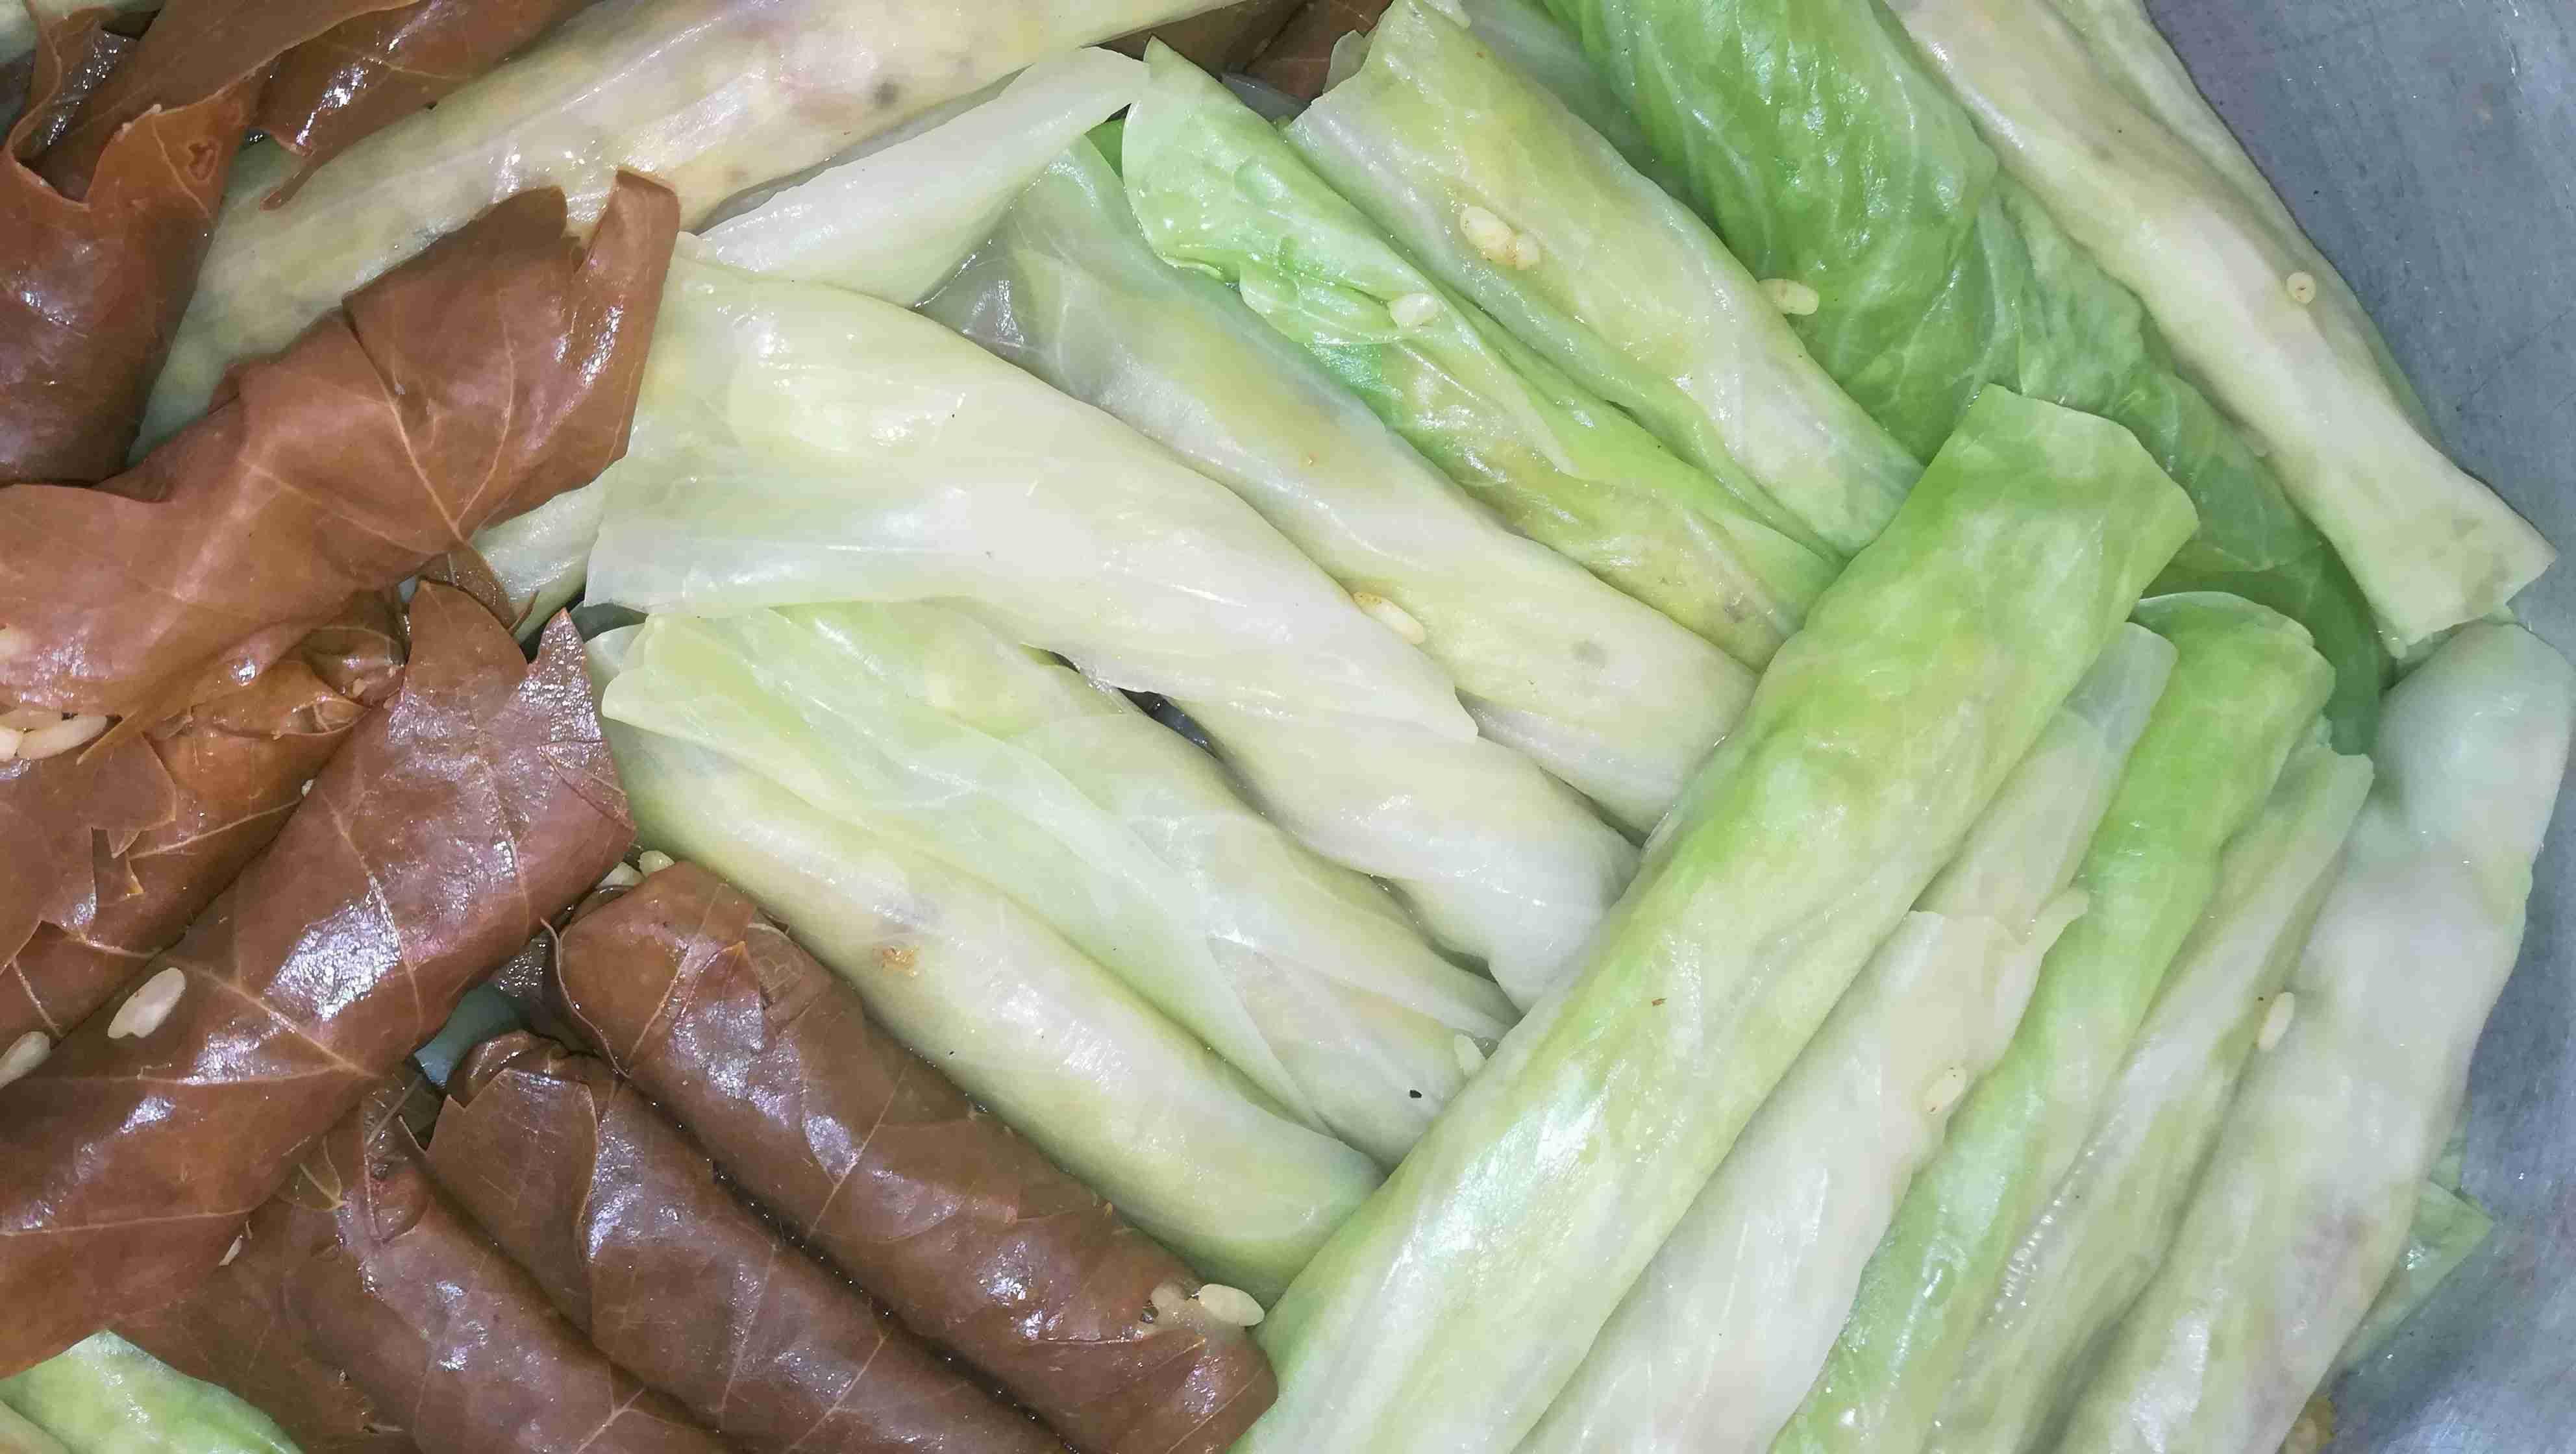 ملفوف مع لحمه وورق دوالي ورق عنب زاكي Middle Eastern Recipes Food Recipes